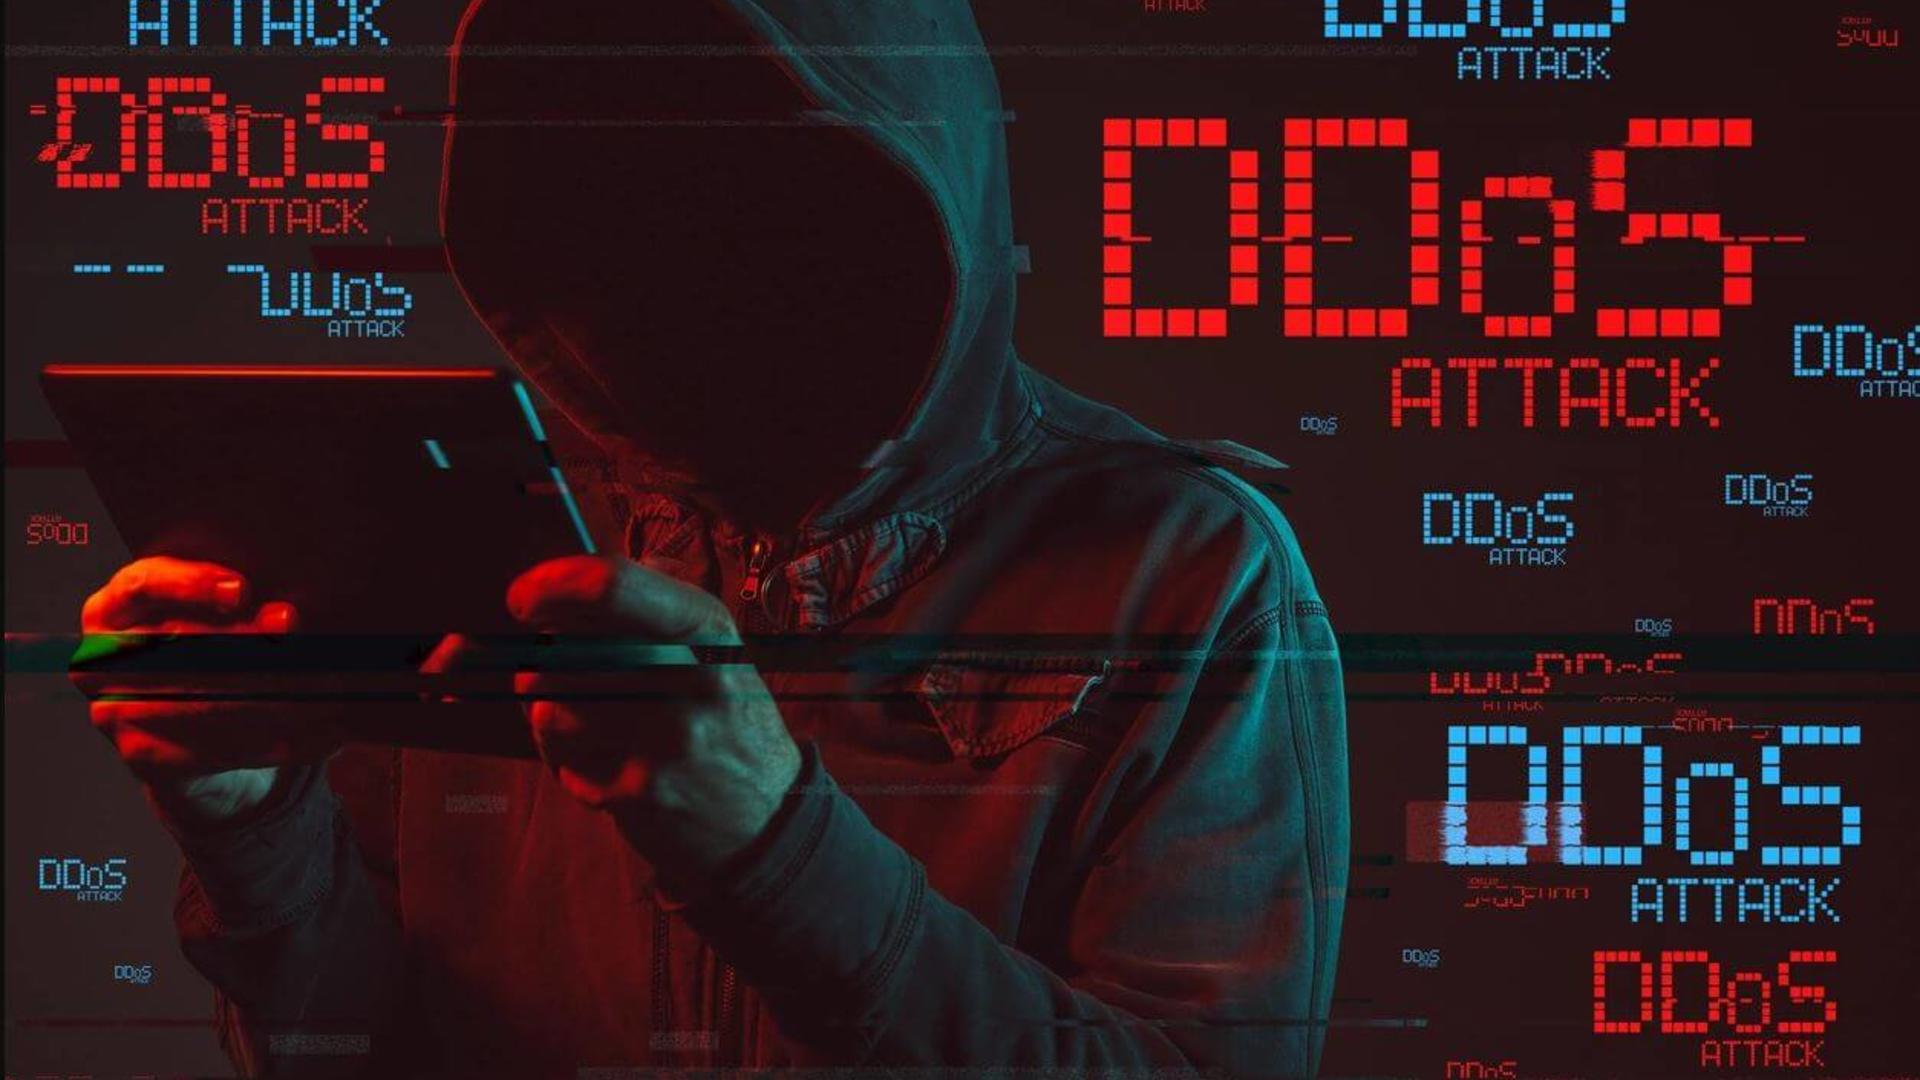 Chống DDOS